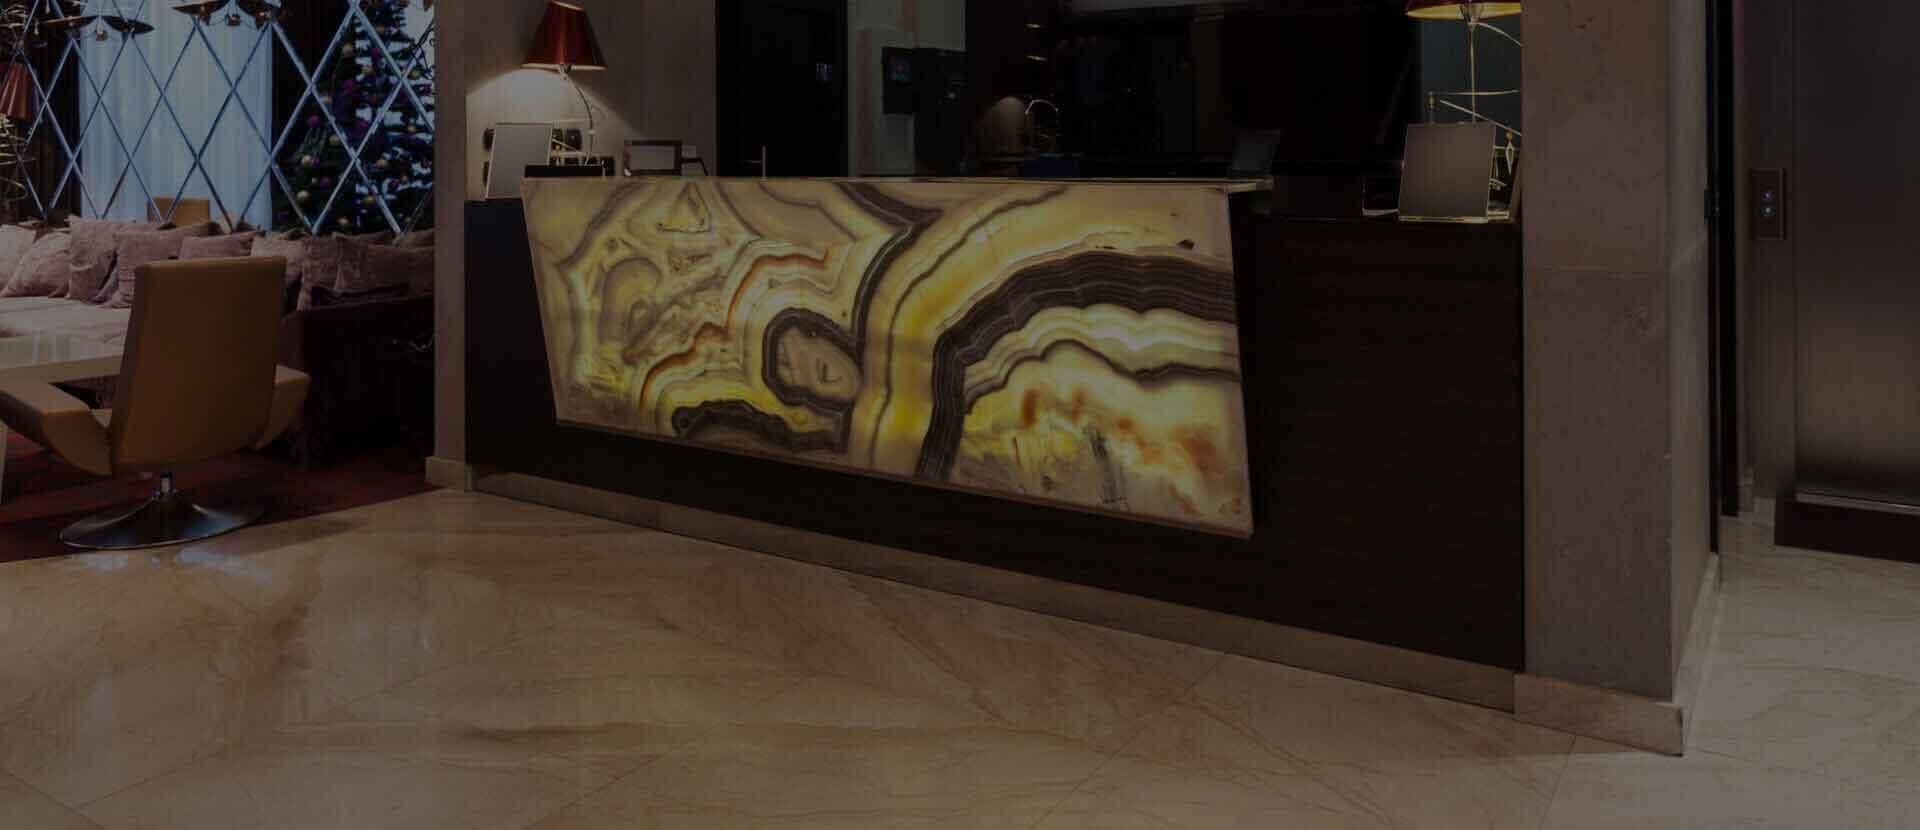 KushalBagh Marbles- Flooring marble